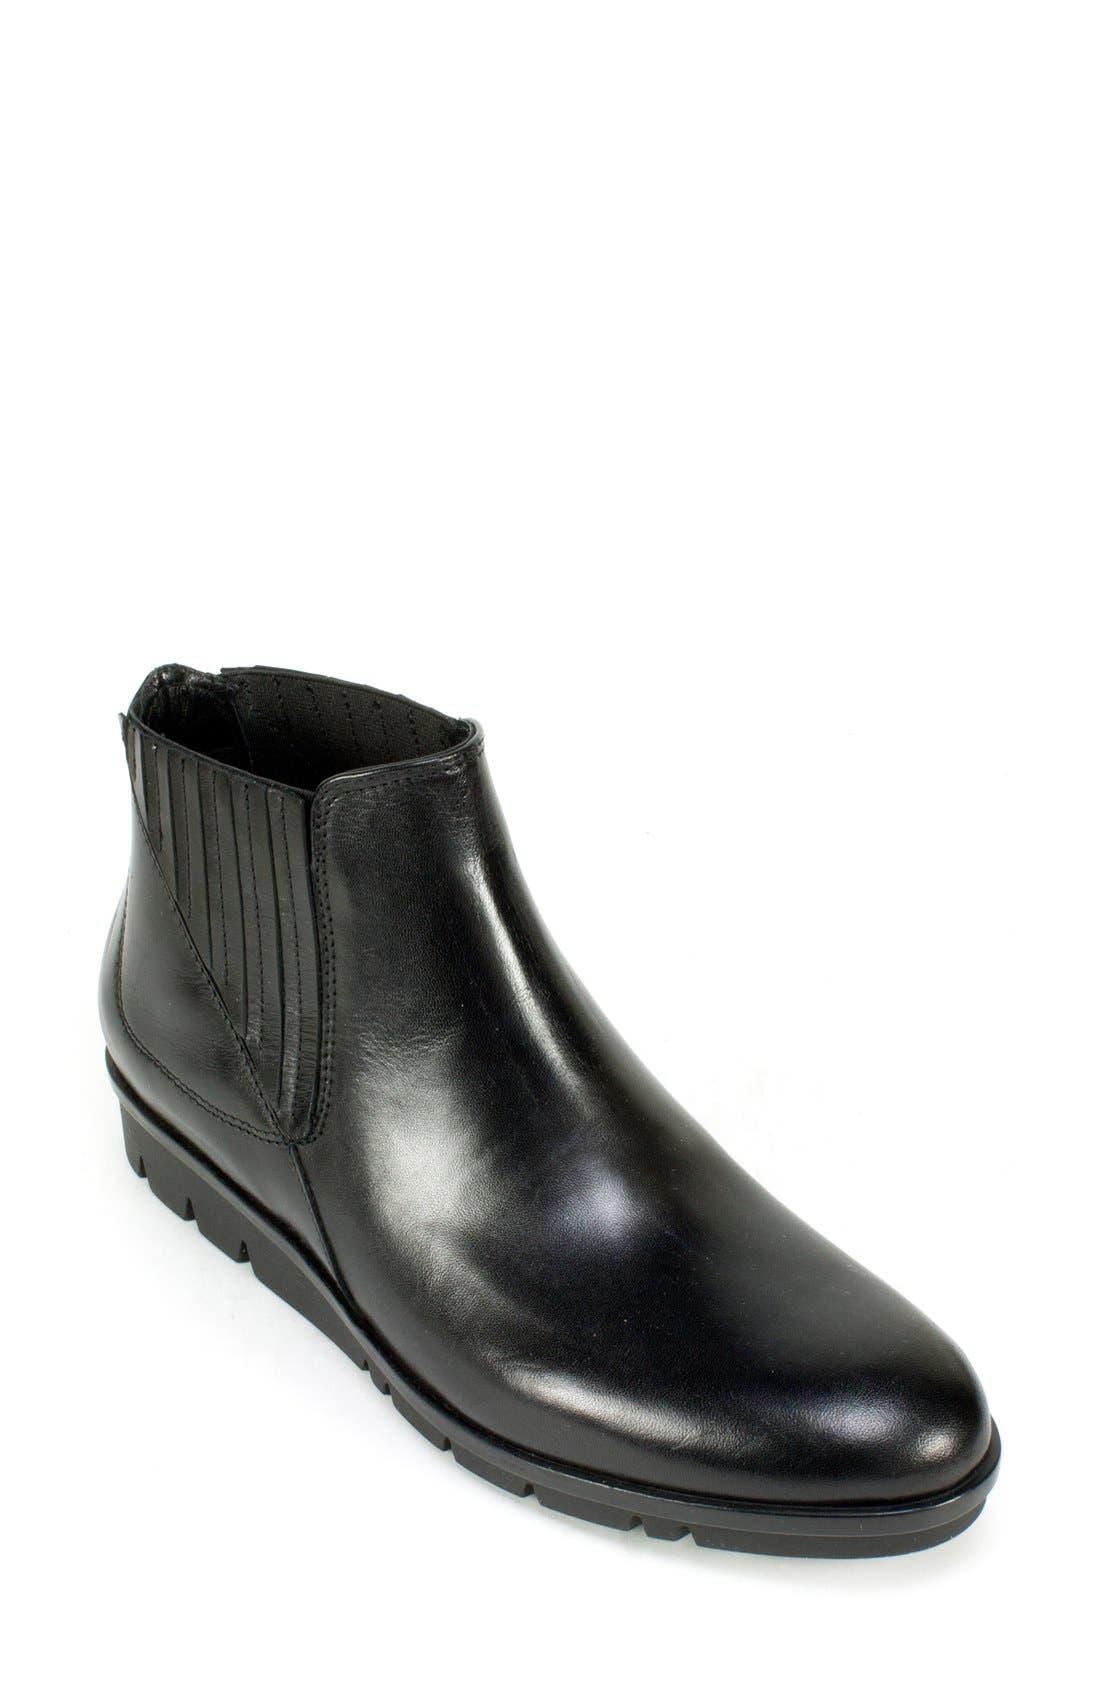 Main Image - Summit 'Whitney' Chelsea Boot (Women)